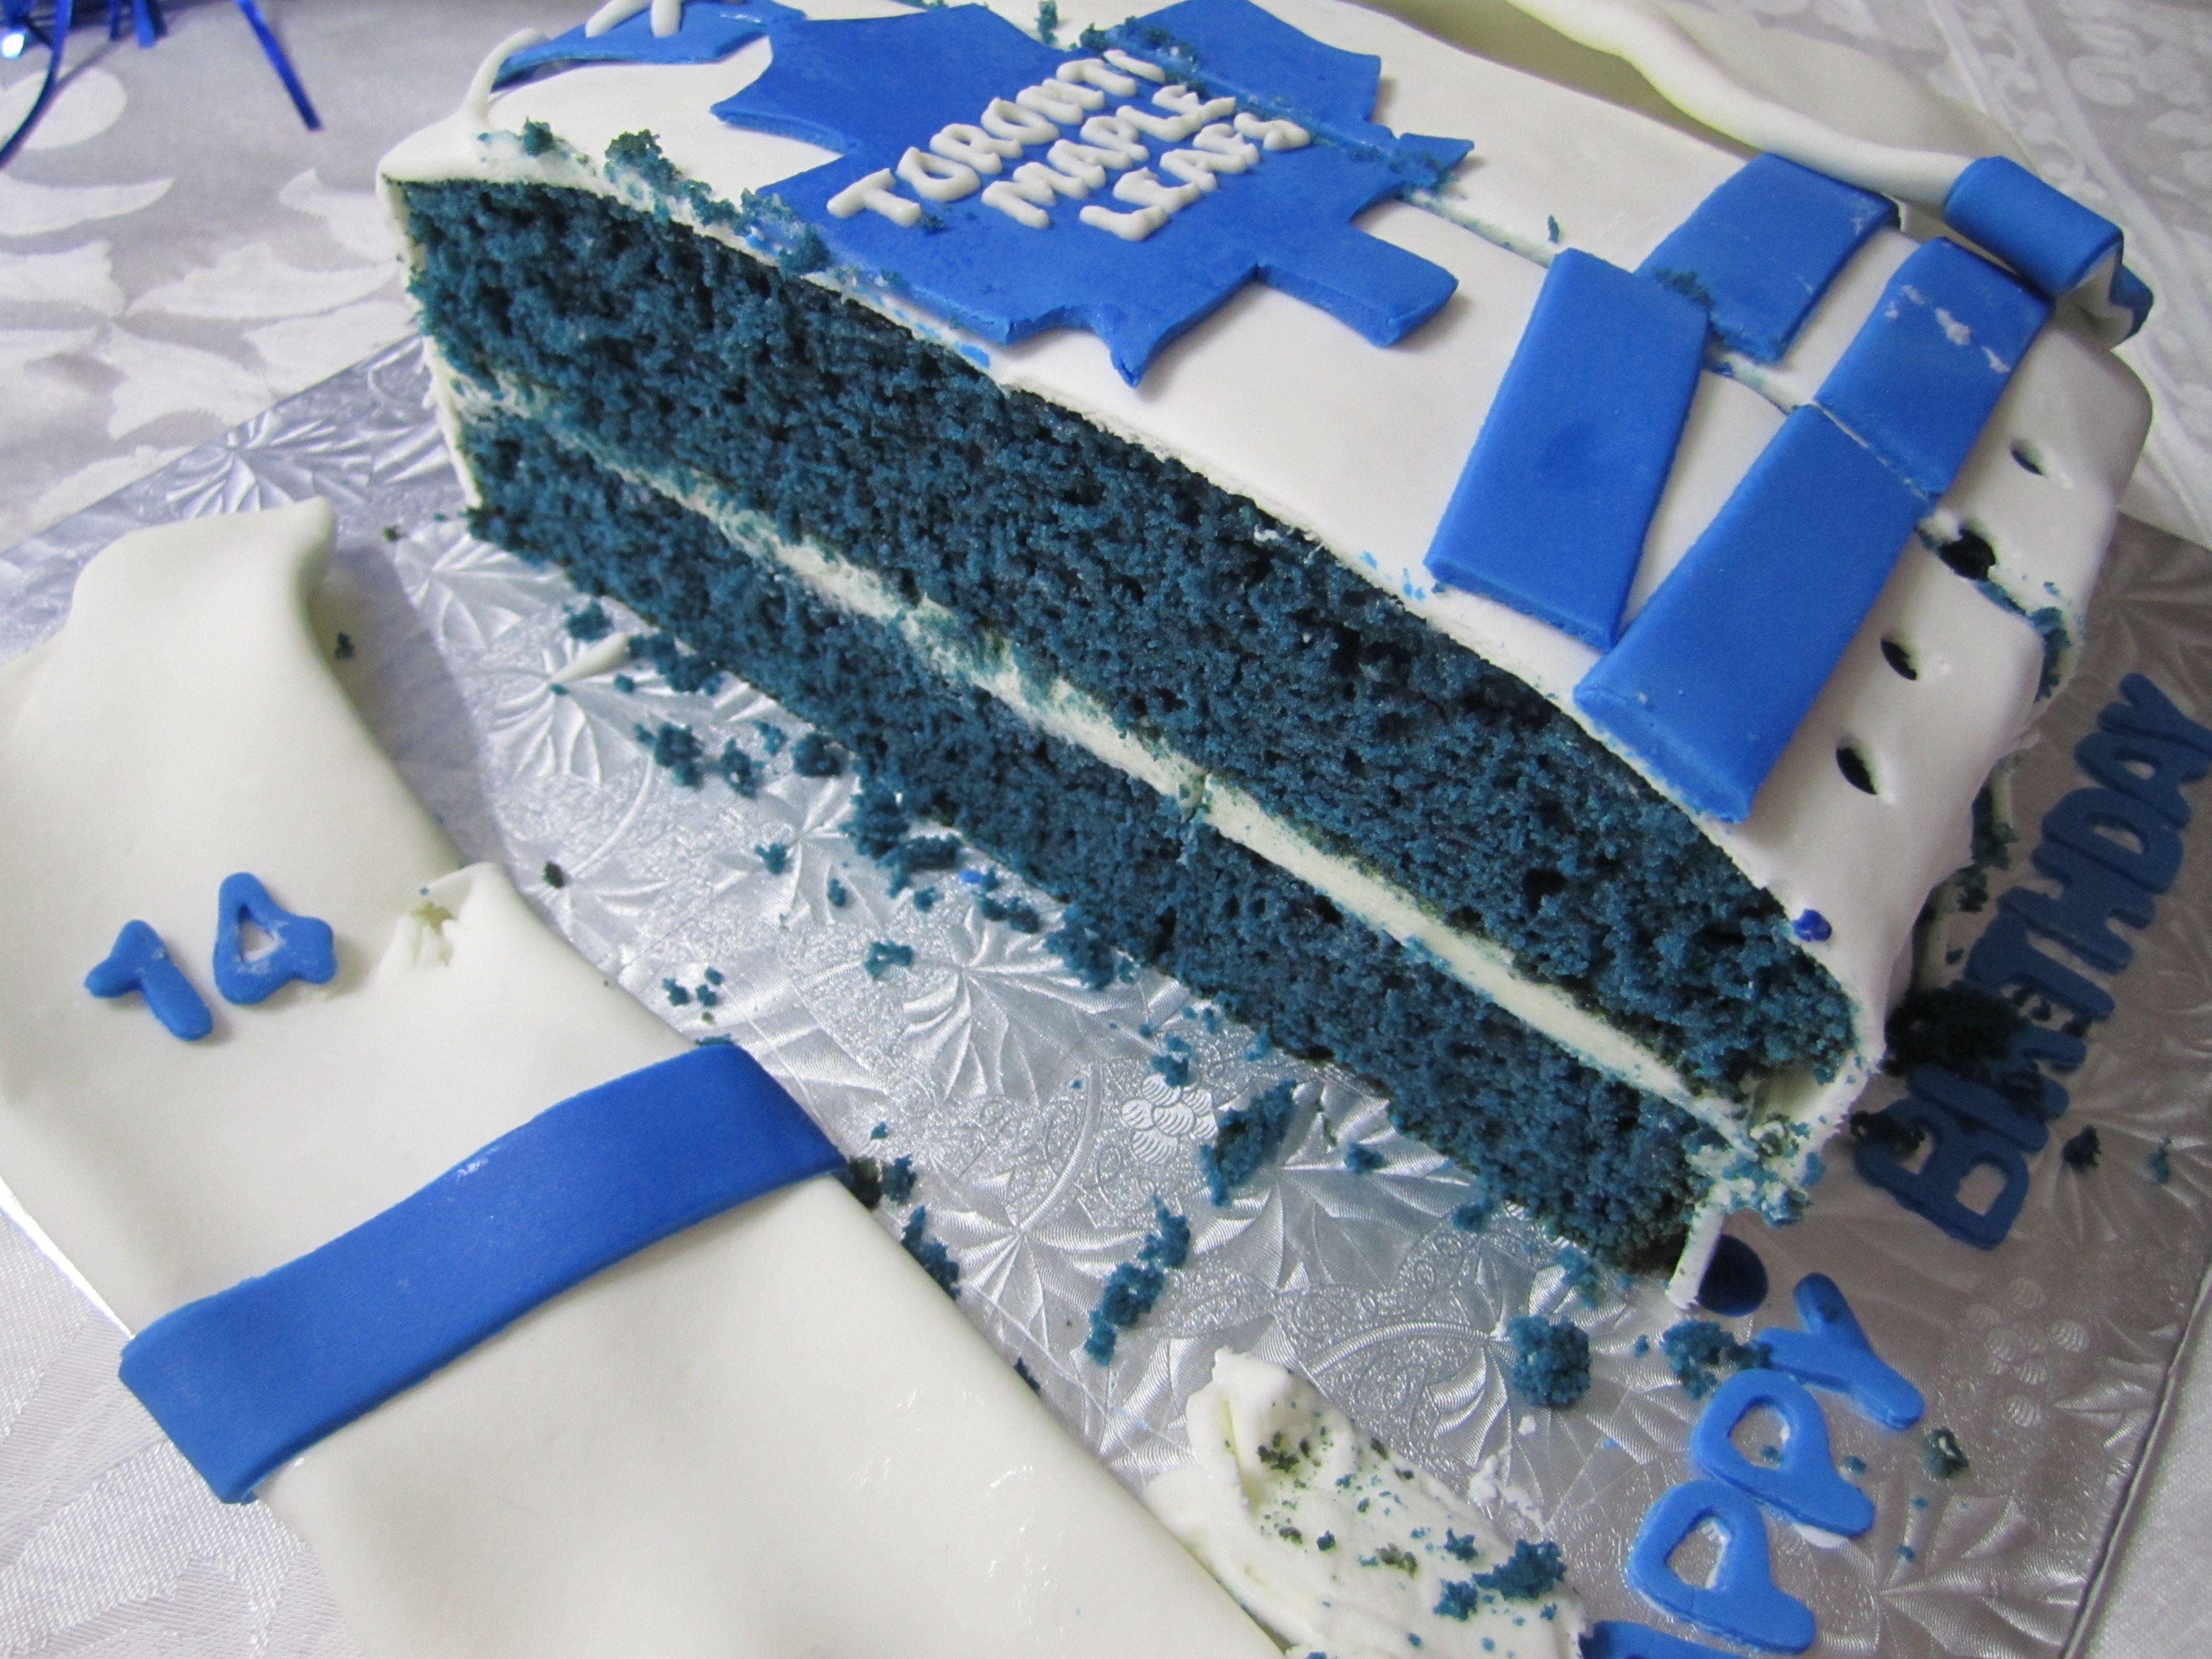 Toronto Maple Leafs Dave Keon Birthday Cake Blue Velvet Things